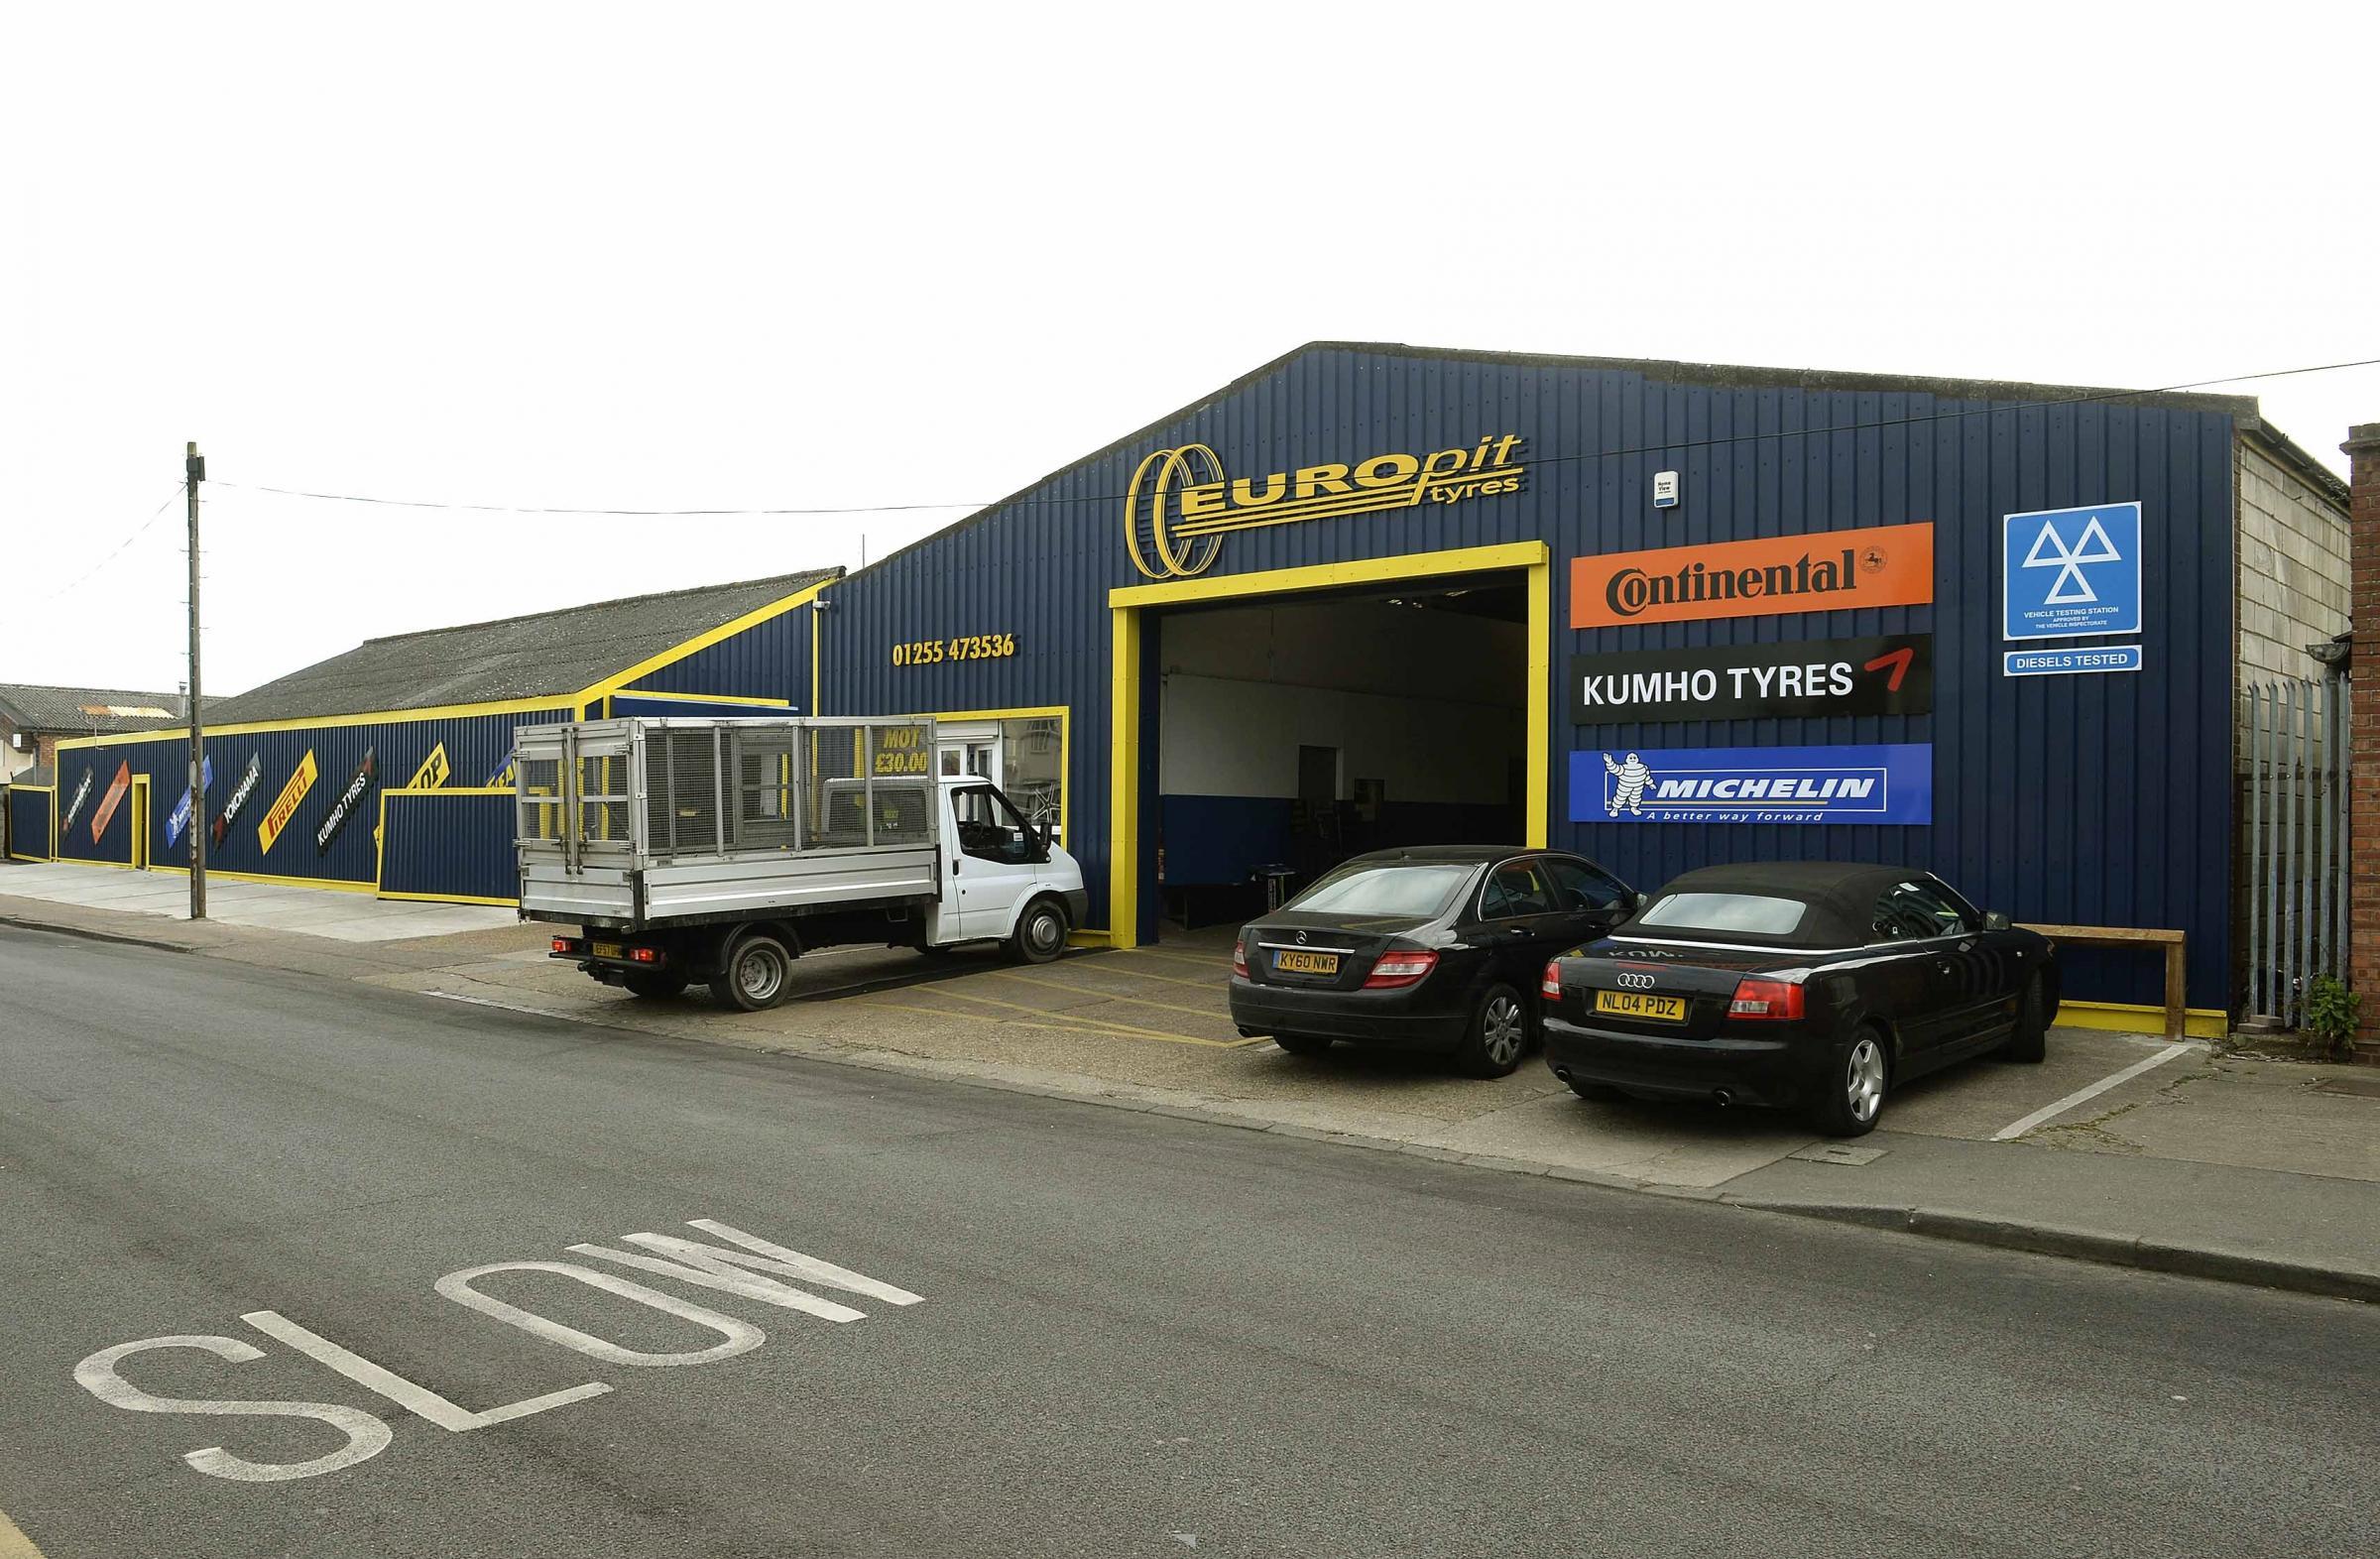 Europit Tyres garage in Clacton could